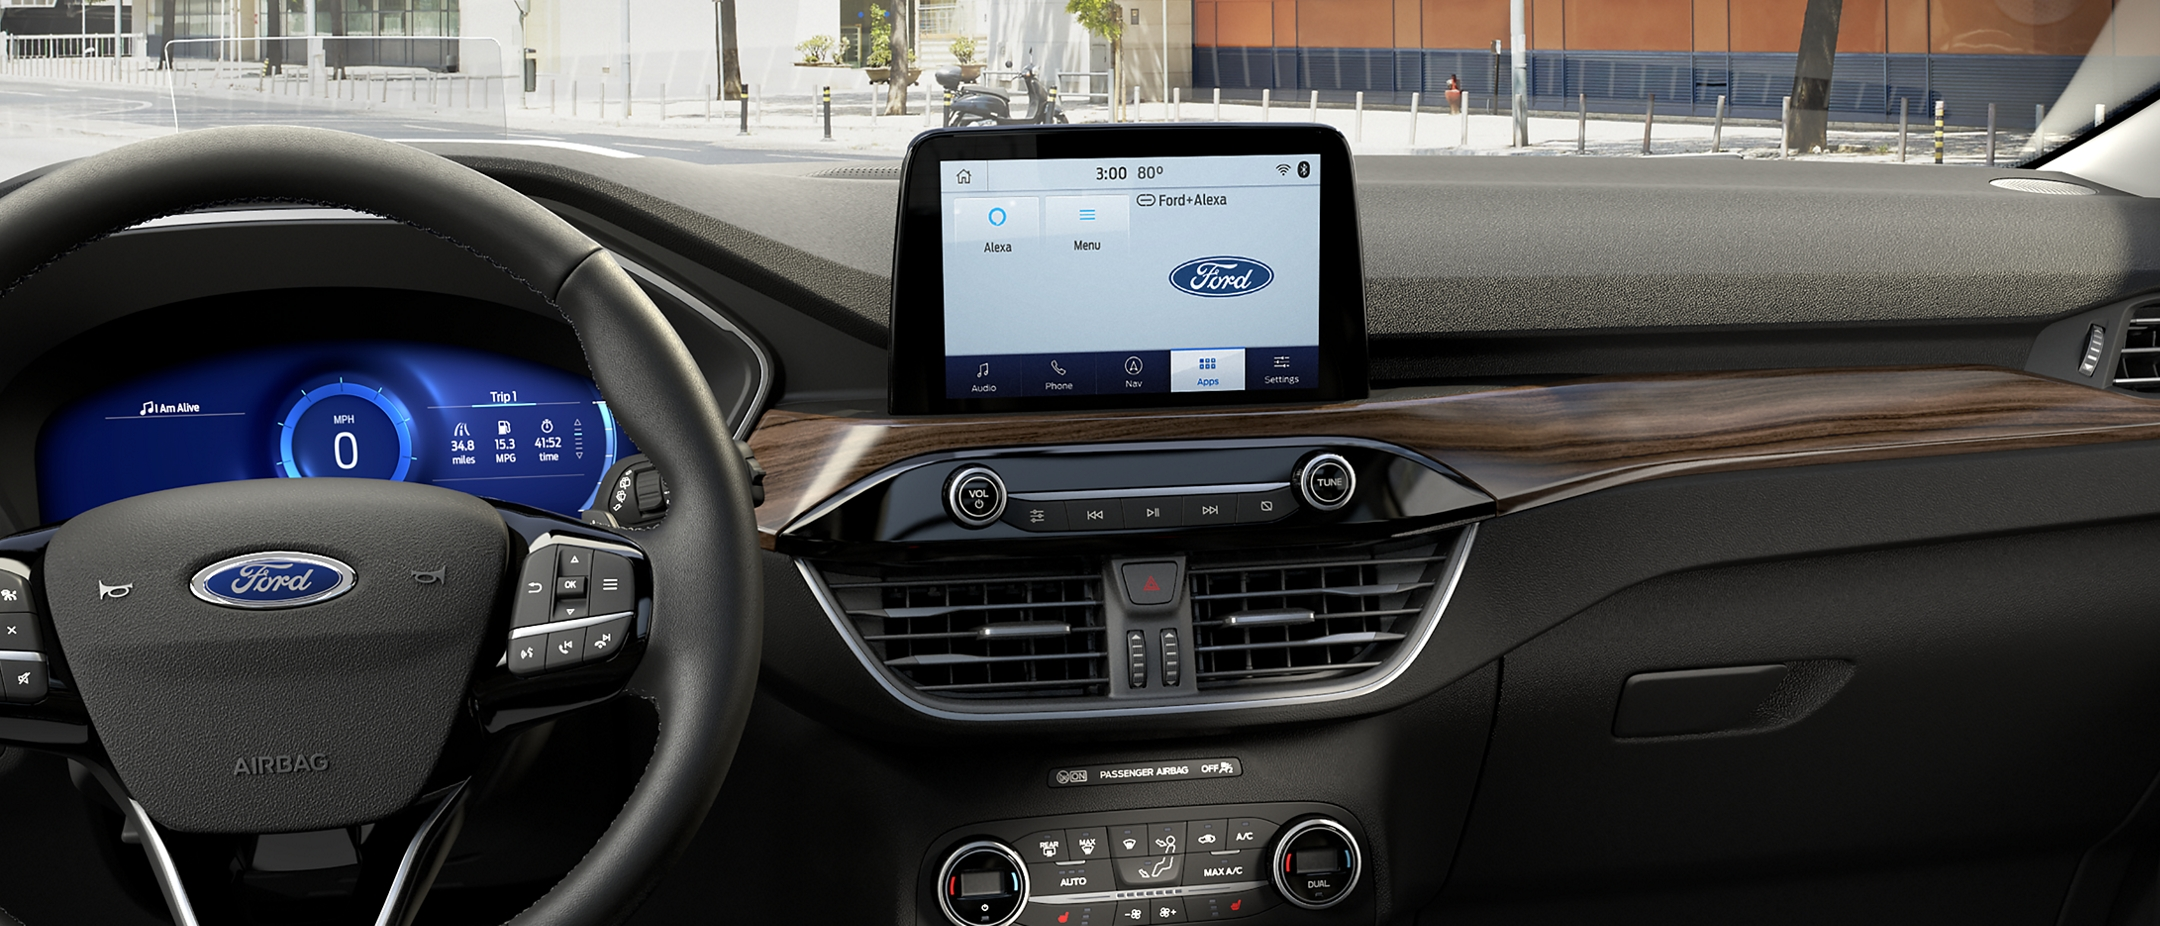 2020 Ford Escape Ford+Alexa App